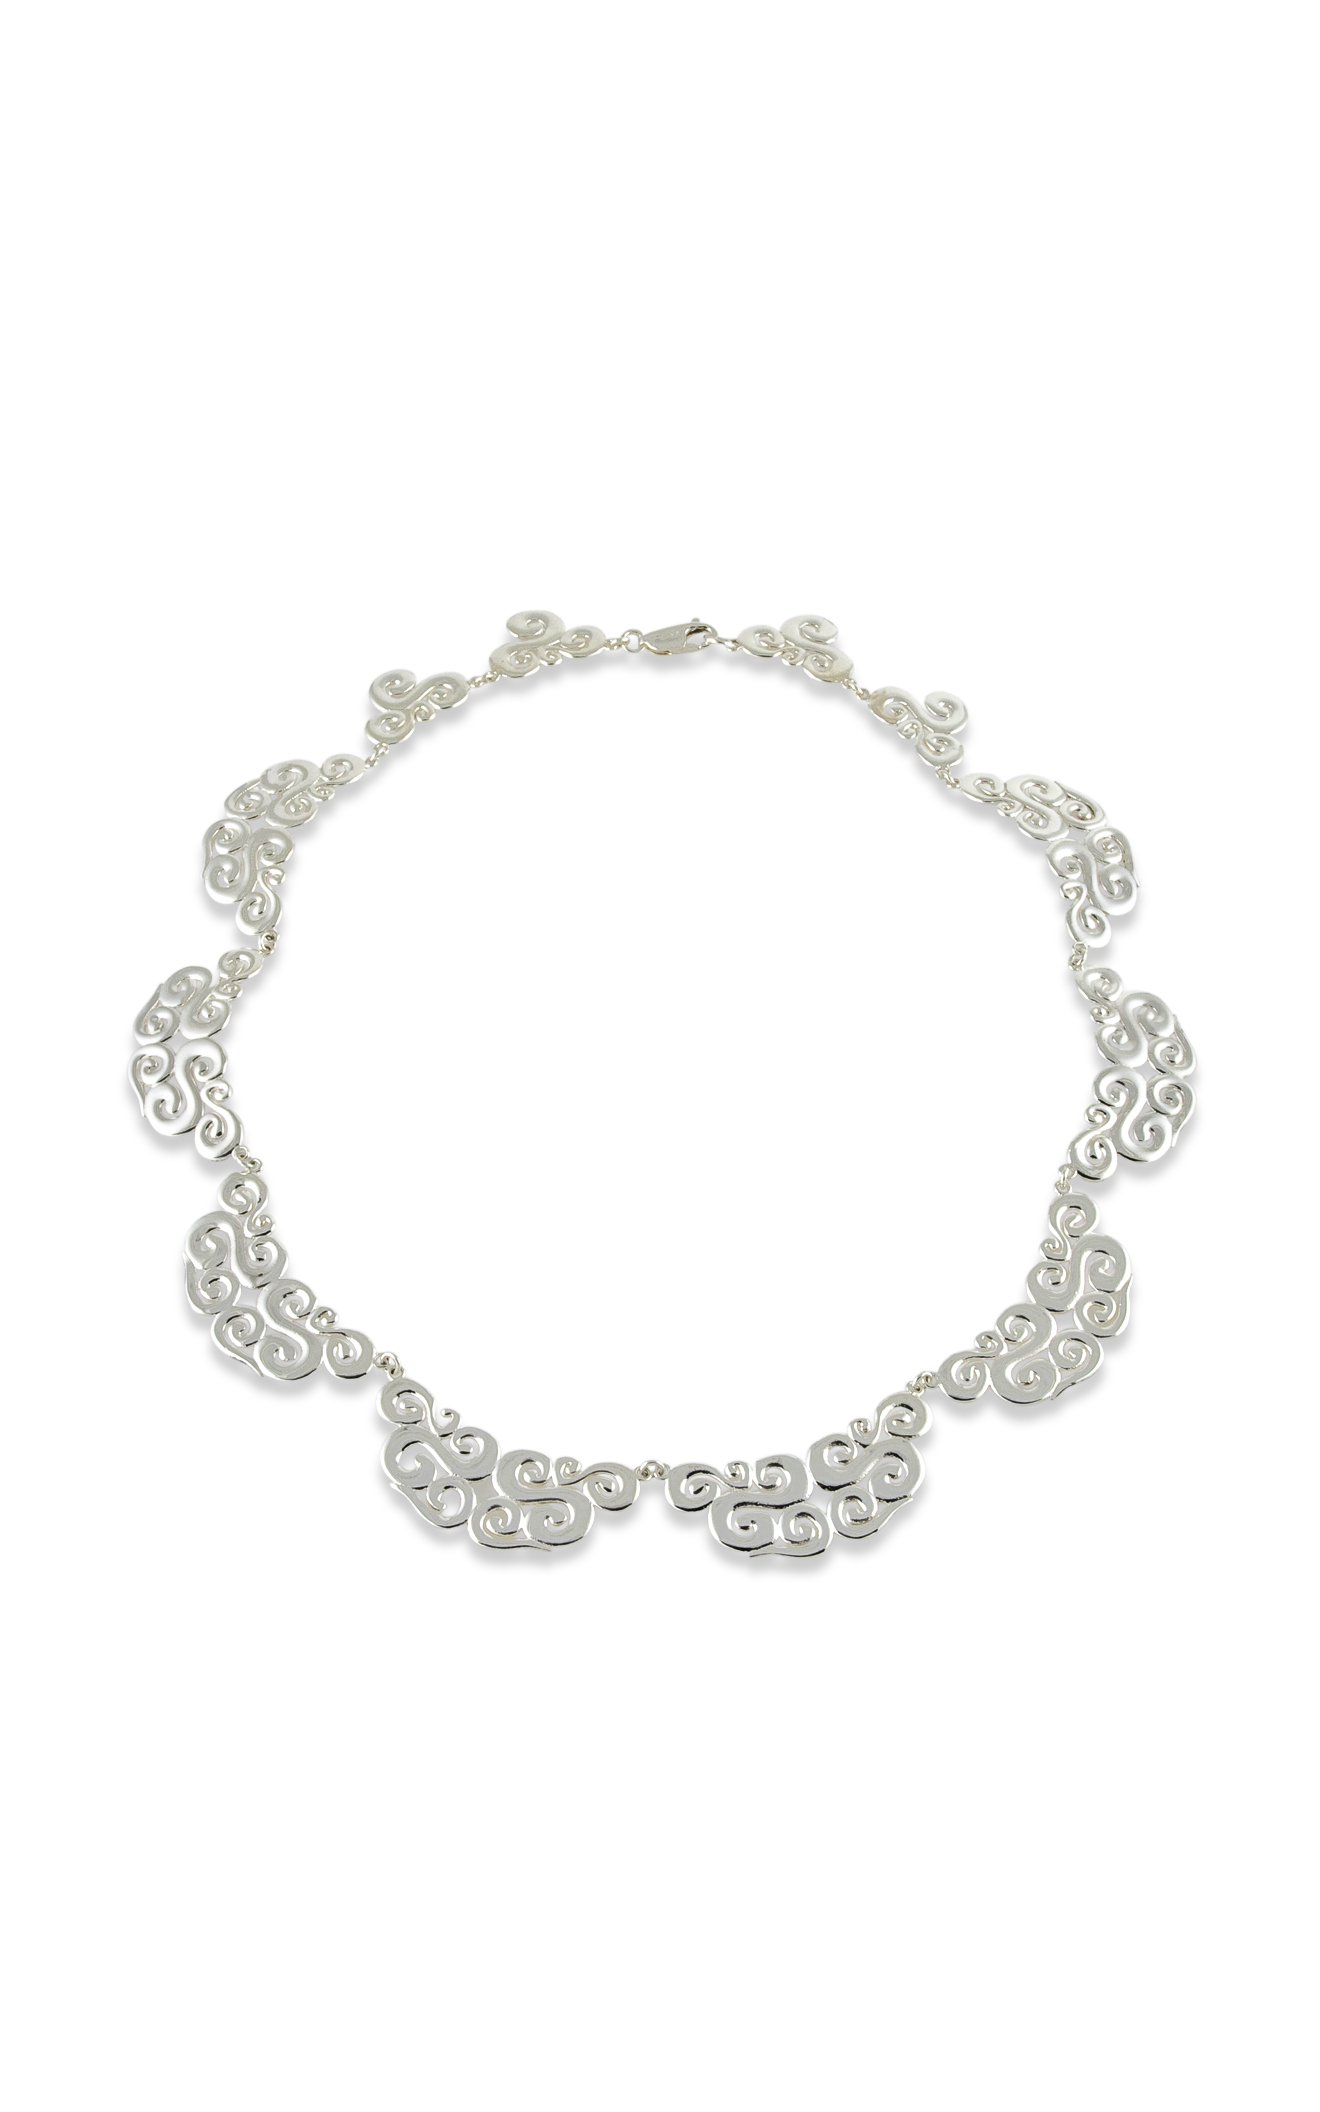 Zina Spiralz Necklace A2257-17 product image